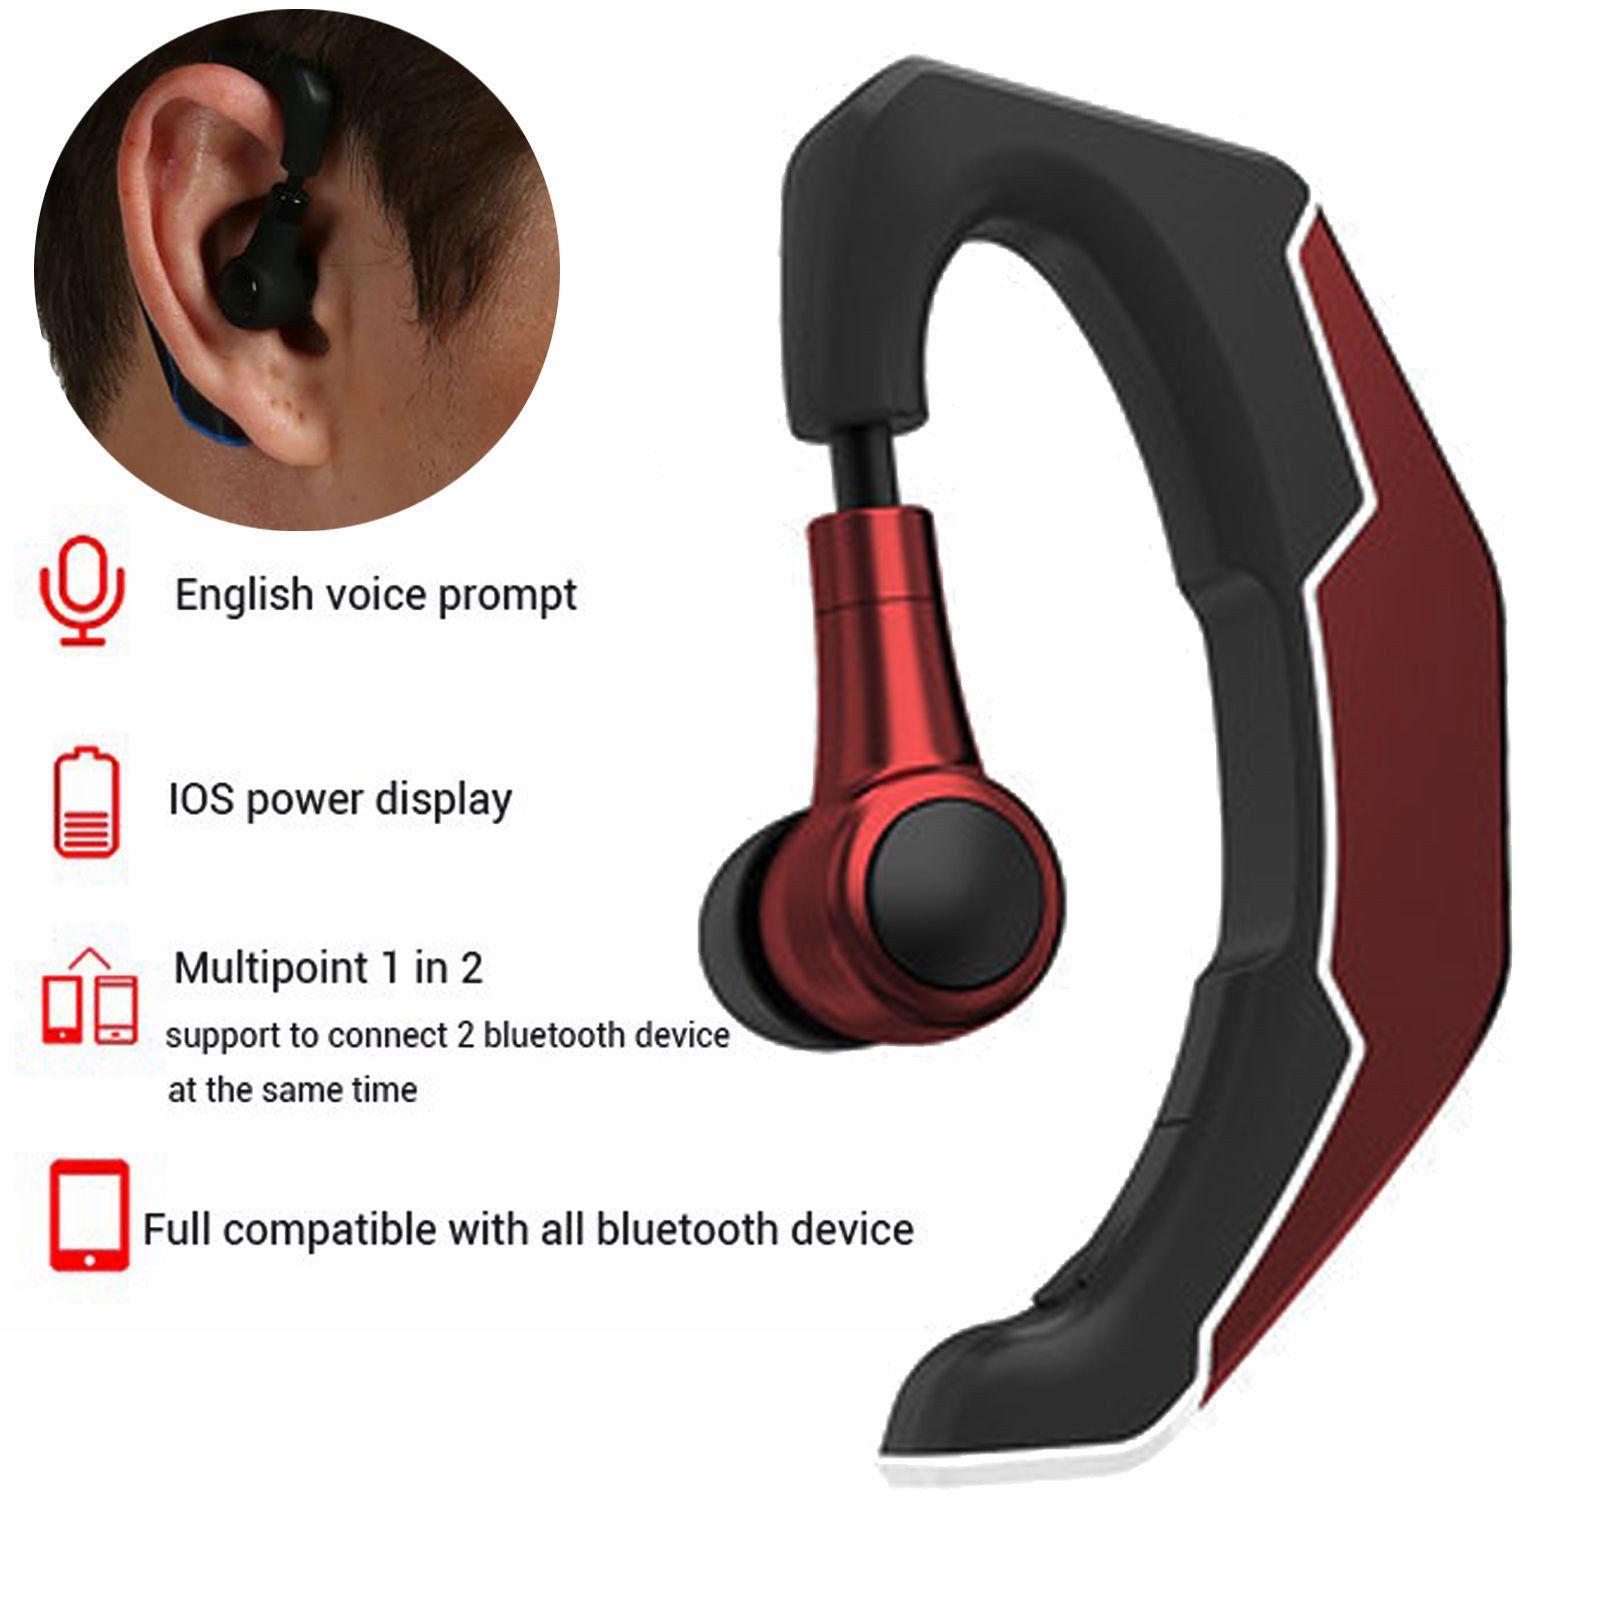 Bluetooth Headphone Headset Wireless Sports Running Earphone Noise Cancelling Handsfree Calling For Car Driving Cell Phones Bluetooth Earphones Headphones Aliexpress